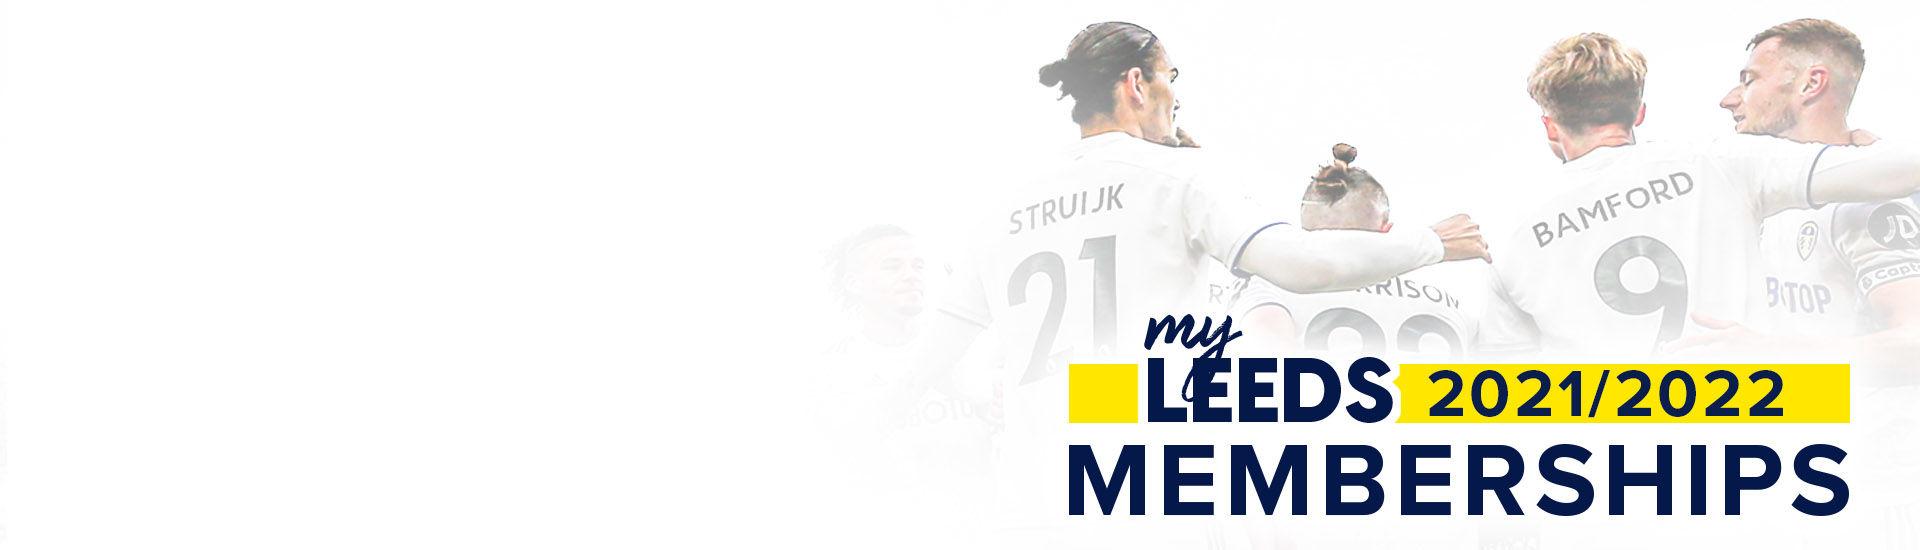 Leeds United 2021/22 Memberships now on sale